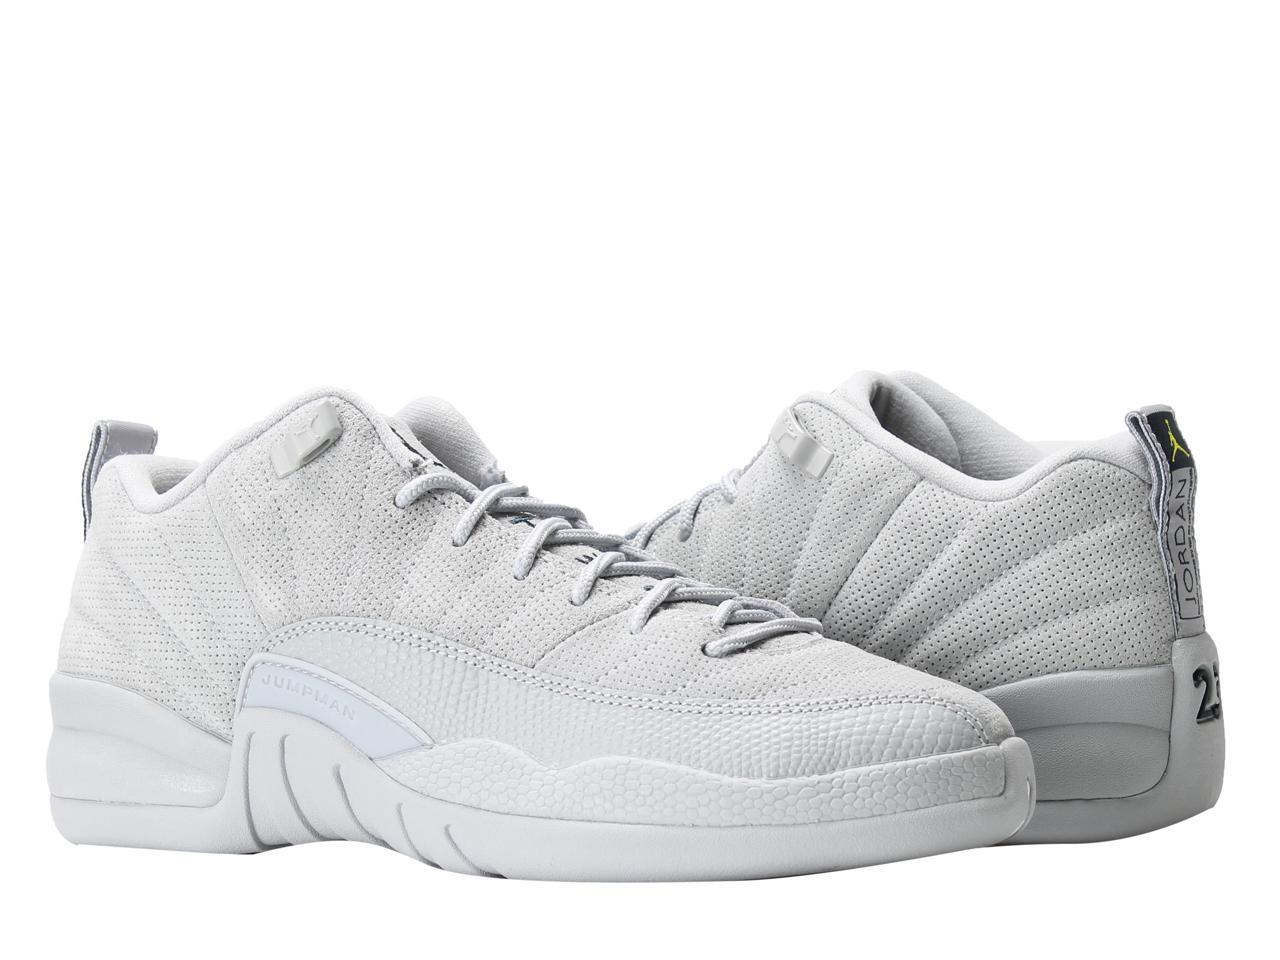 Nike Air Jordan 12 Retro Low BG Wolf Shoes Grey Big Kids Basketball Shoes Wolf 308305-002 Size 4.5 85c862